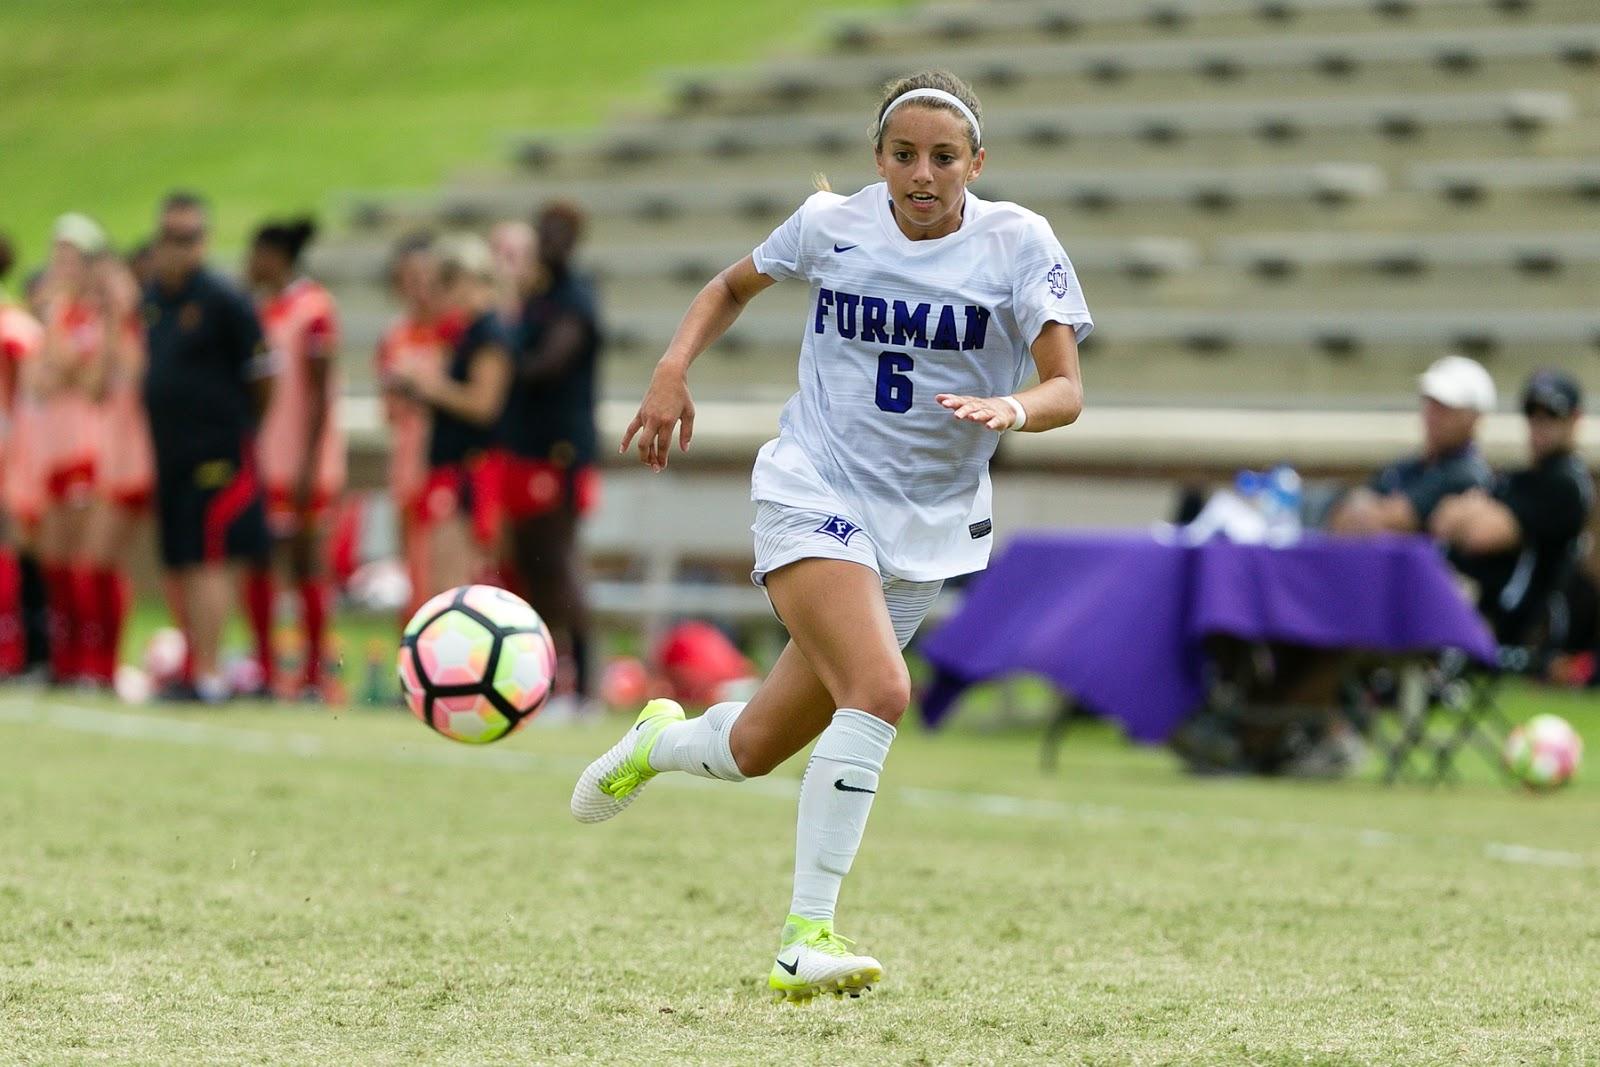 Furman Sports Report: Women's soccer team ready for SoCon play